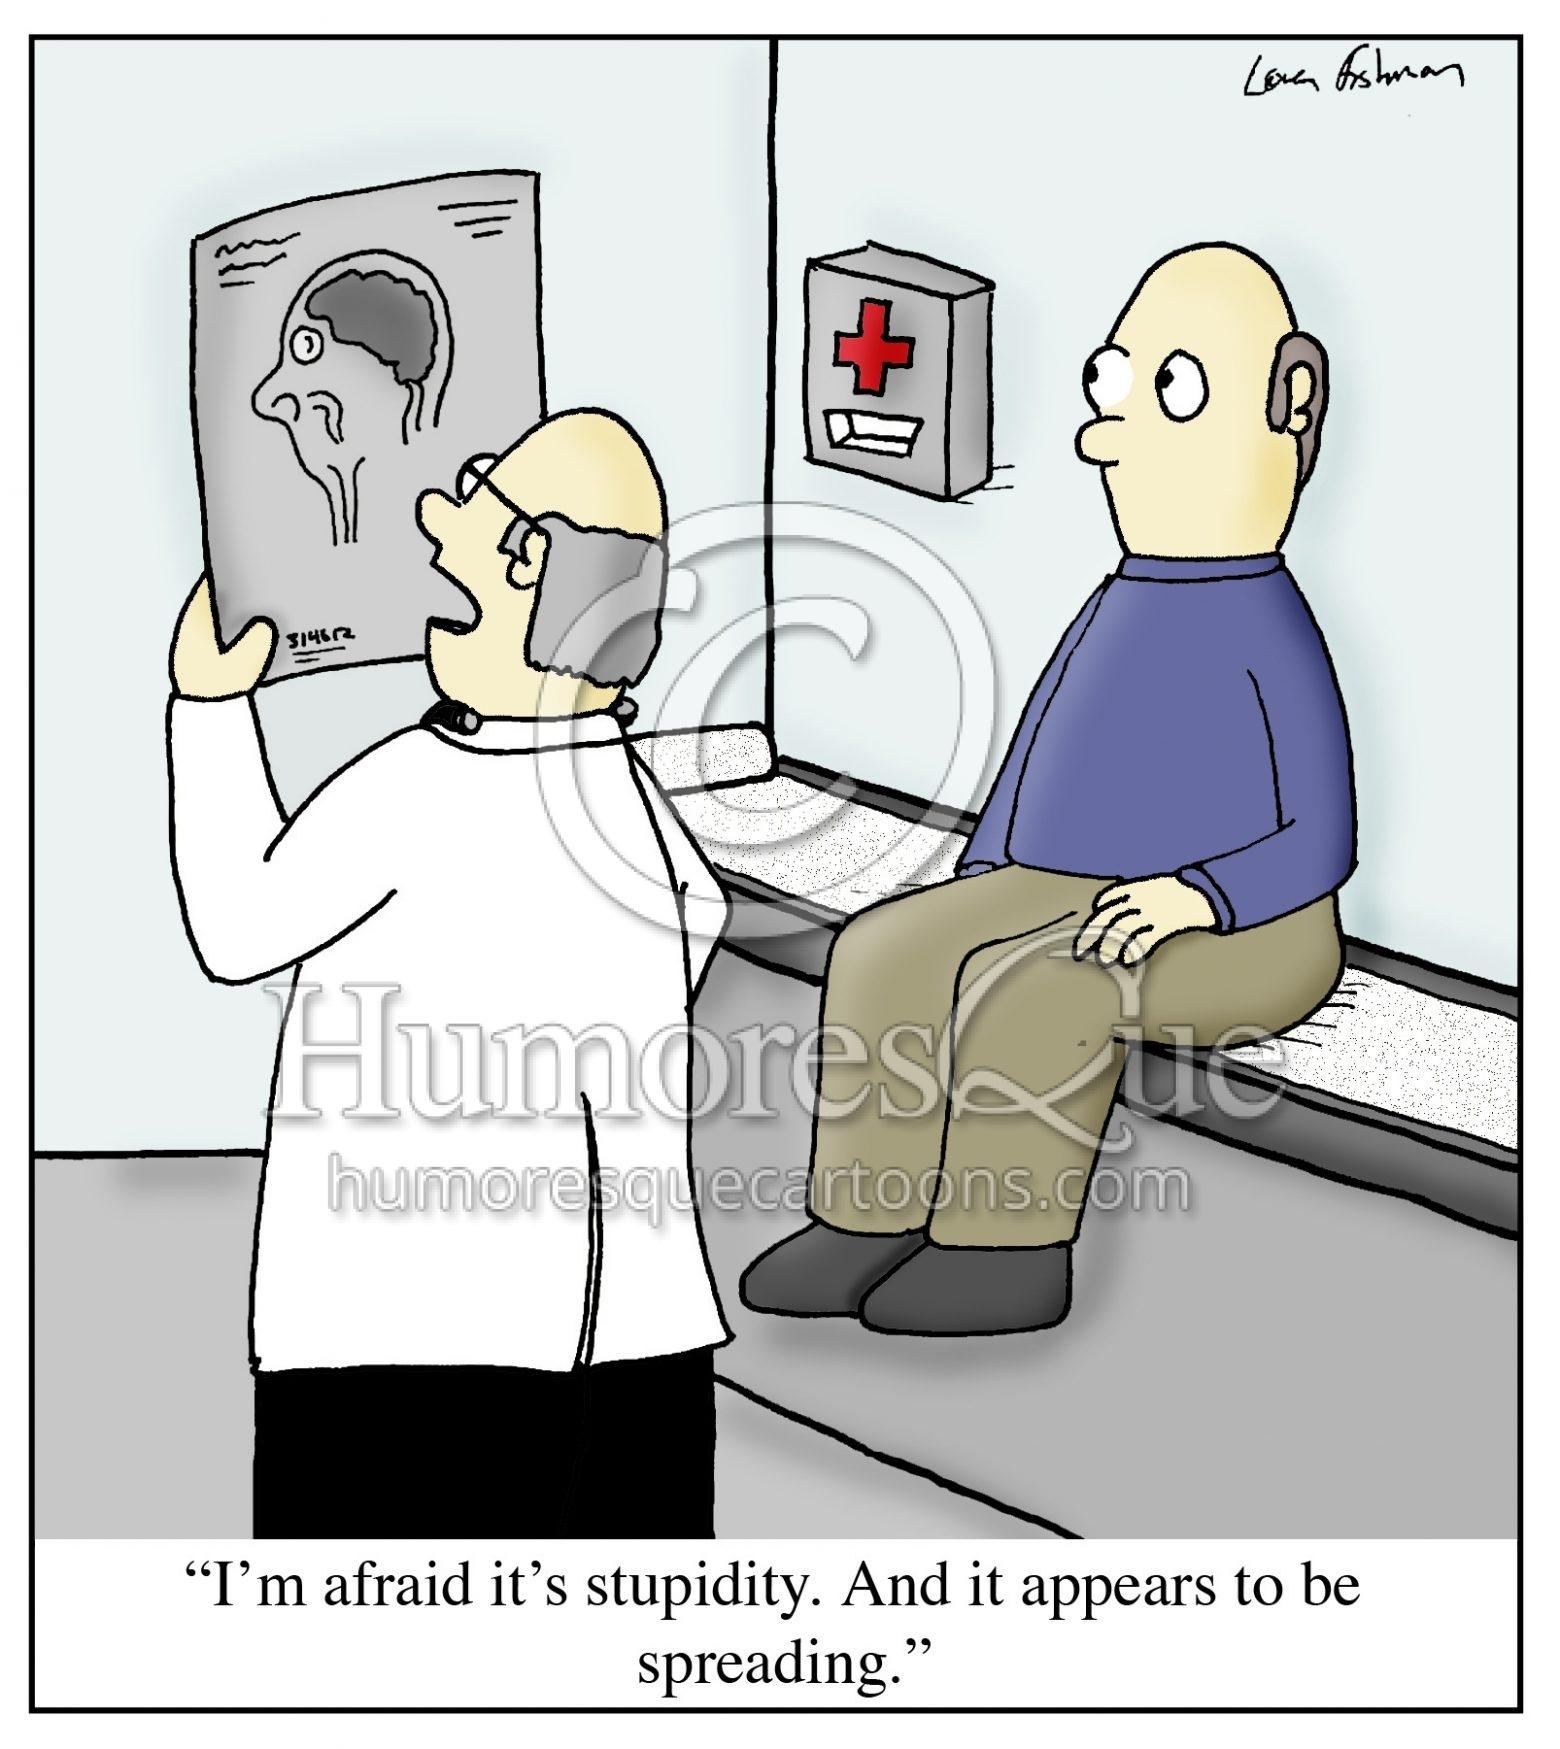 stupidity spreading medical cartoon